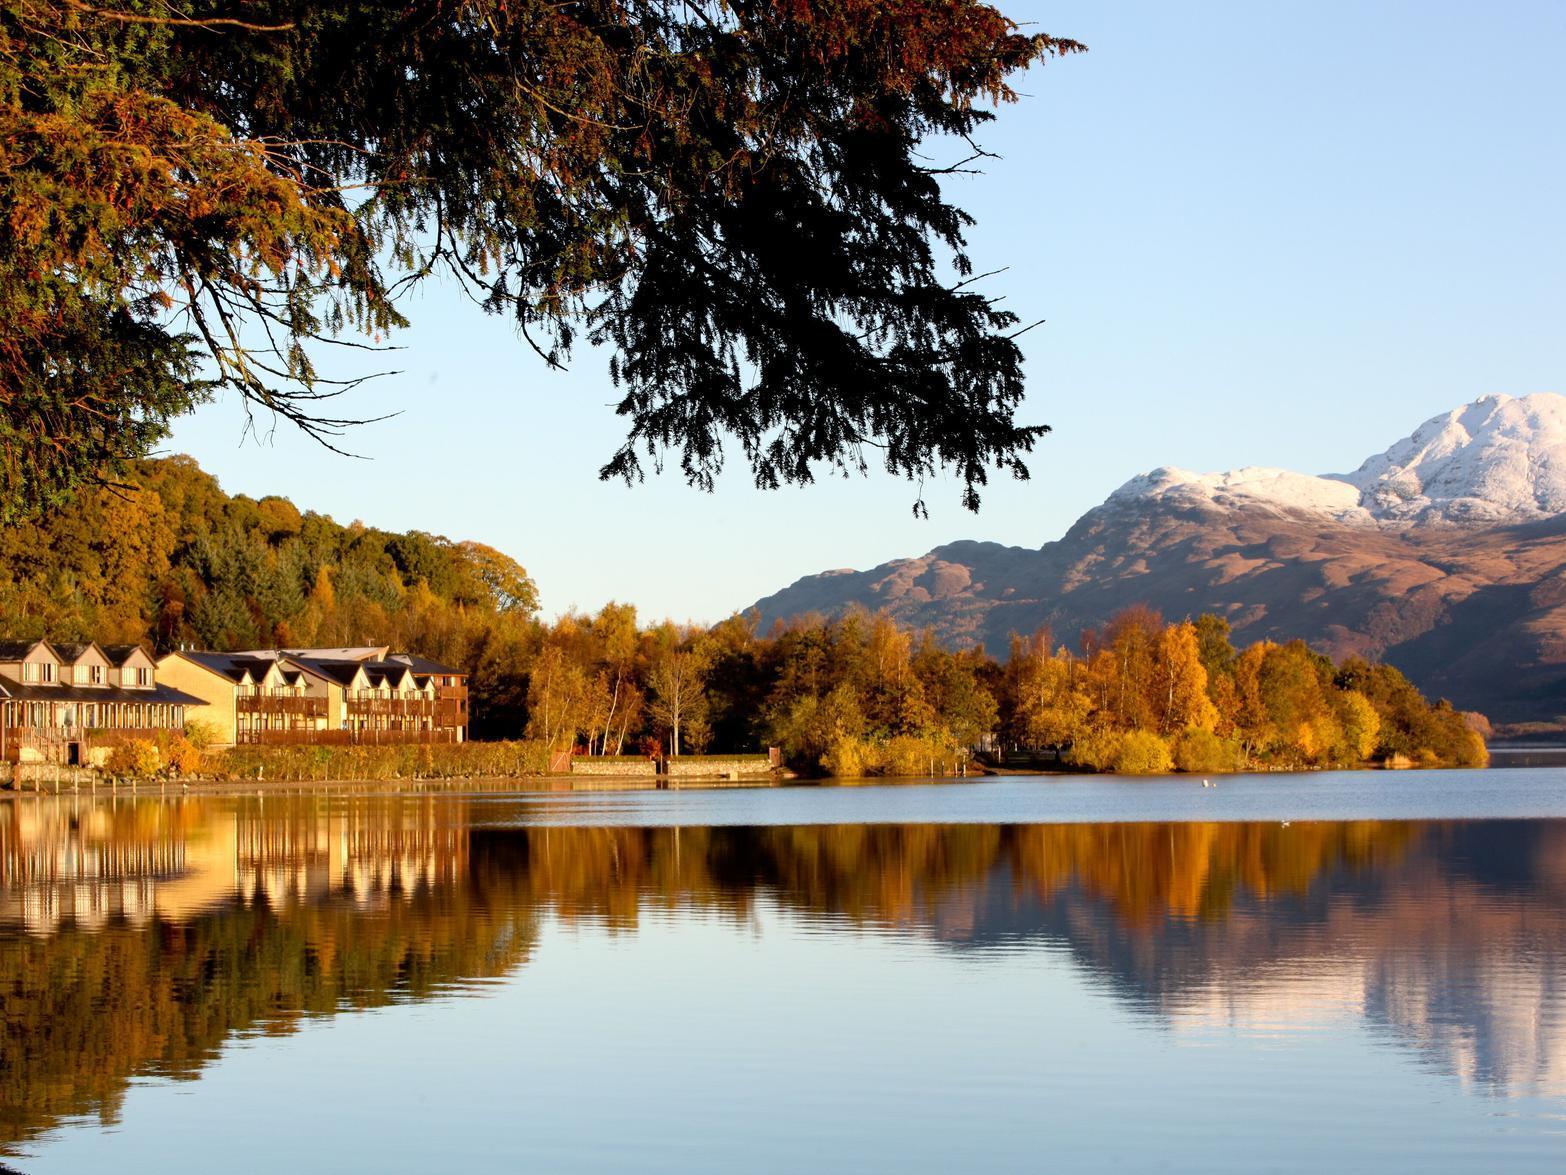 'breathtaking Views' On Offer At Scotland's Loch Lomond photo